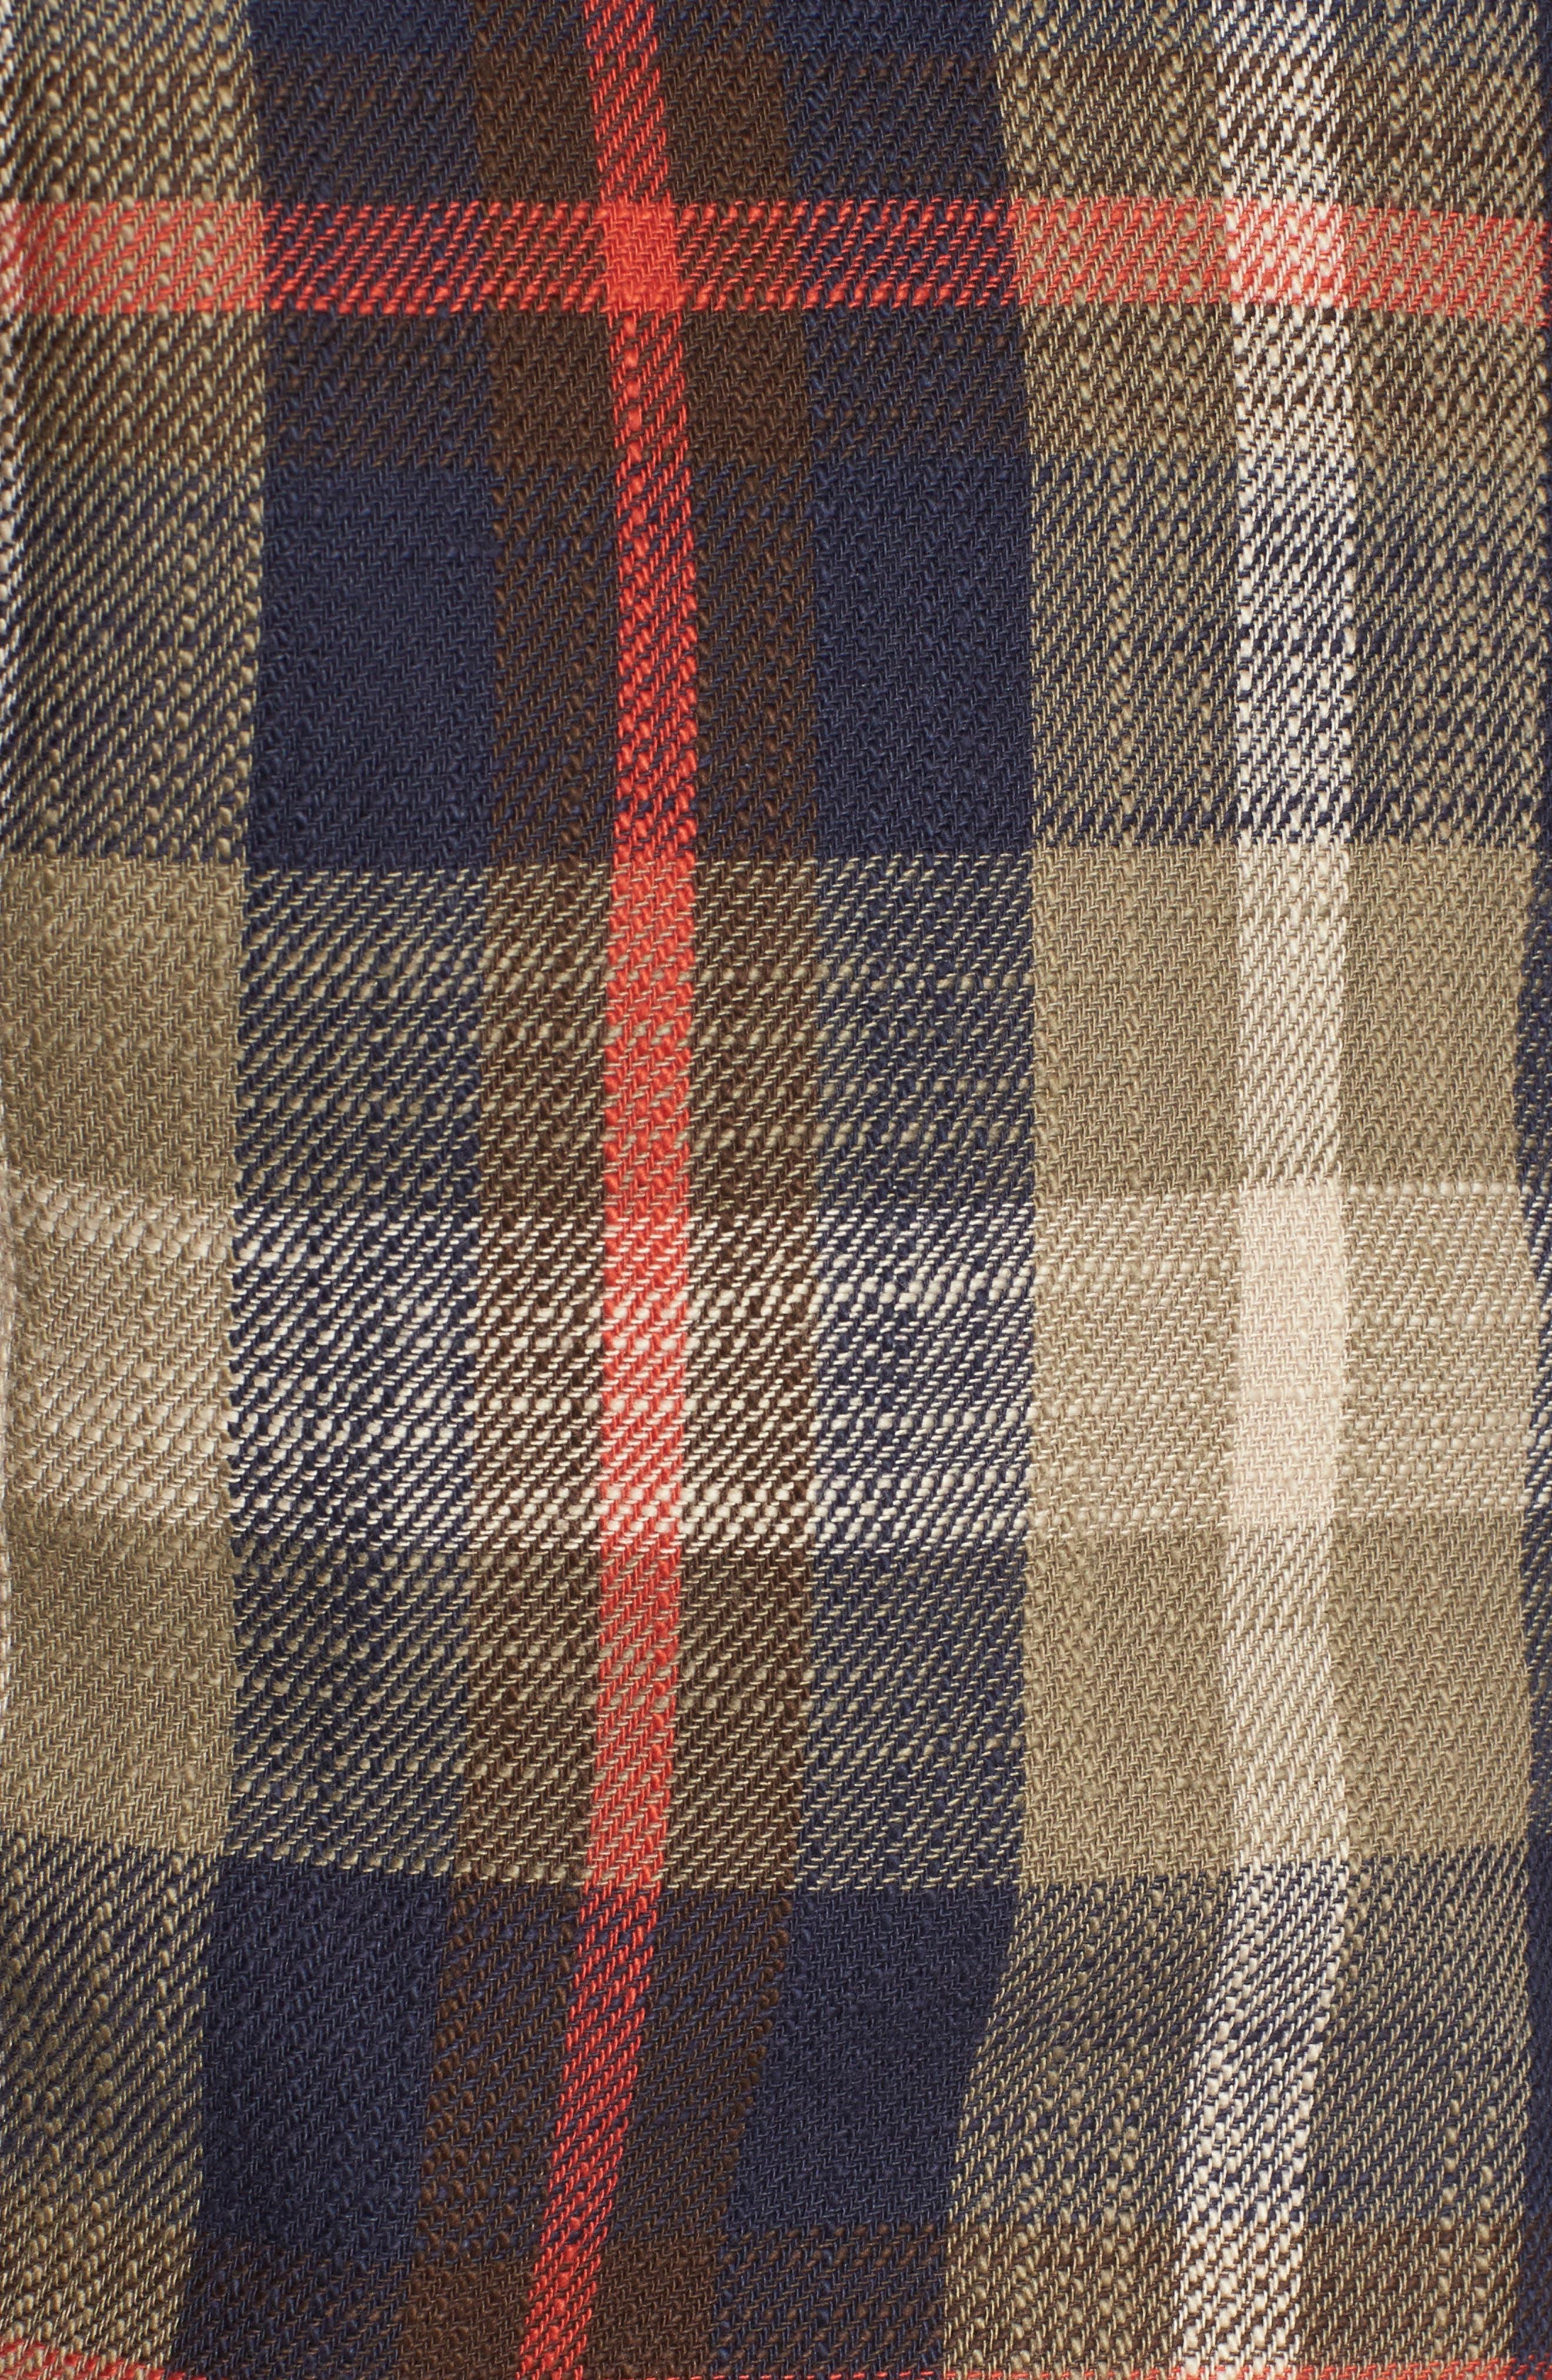 Brae Plaid Flannel Shirt,                             Alternate thumbnail 5, color,                             300